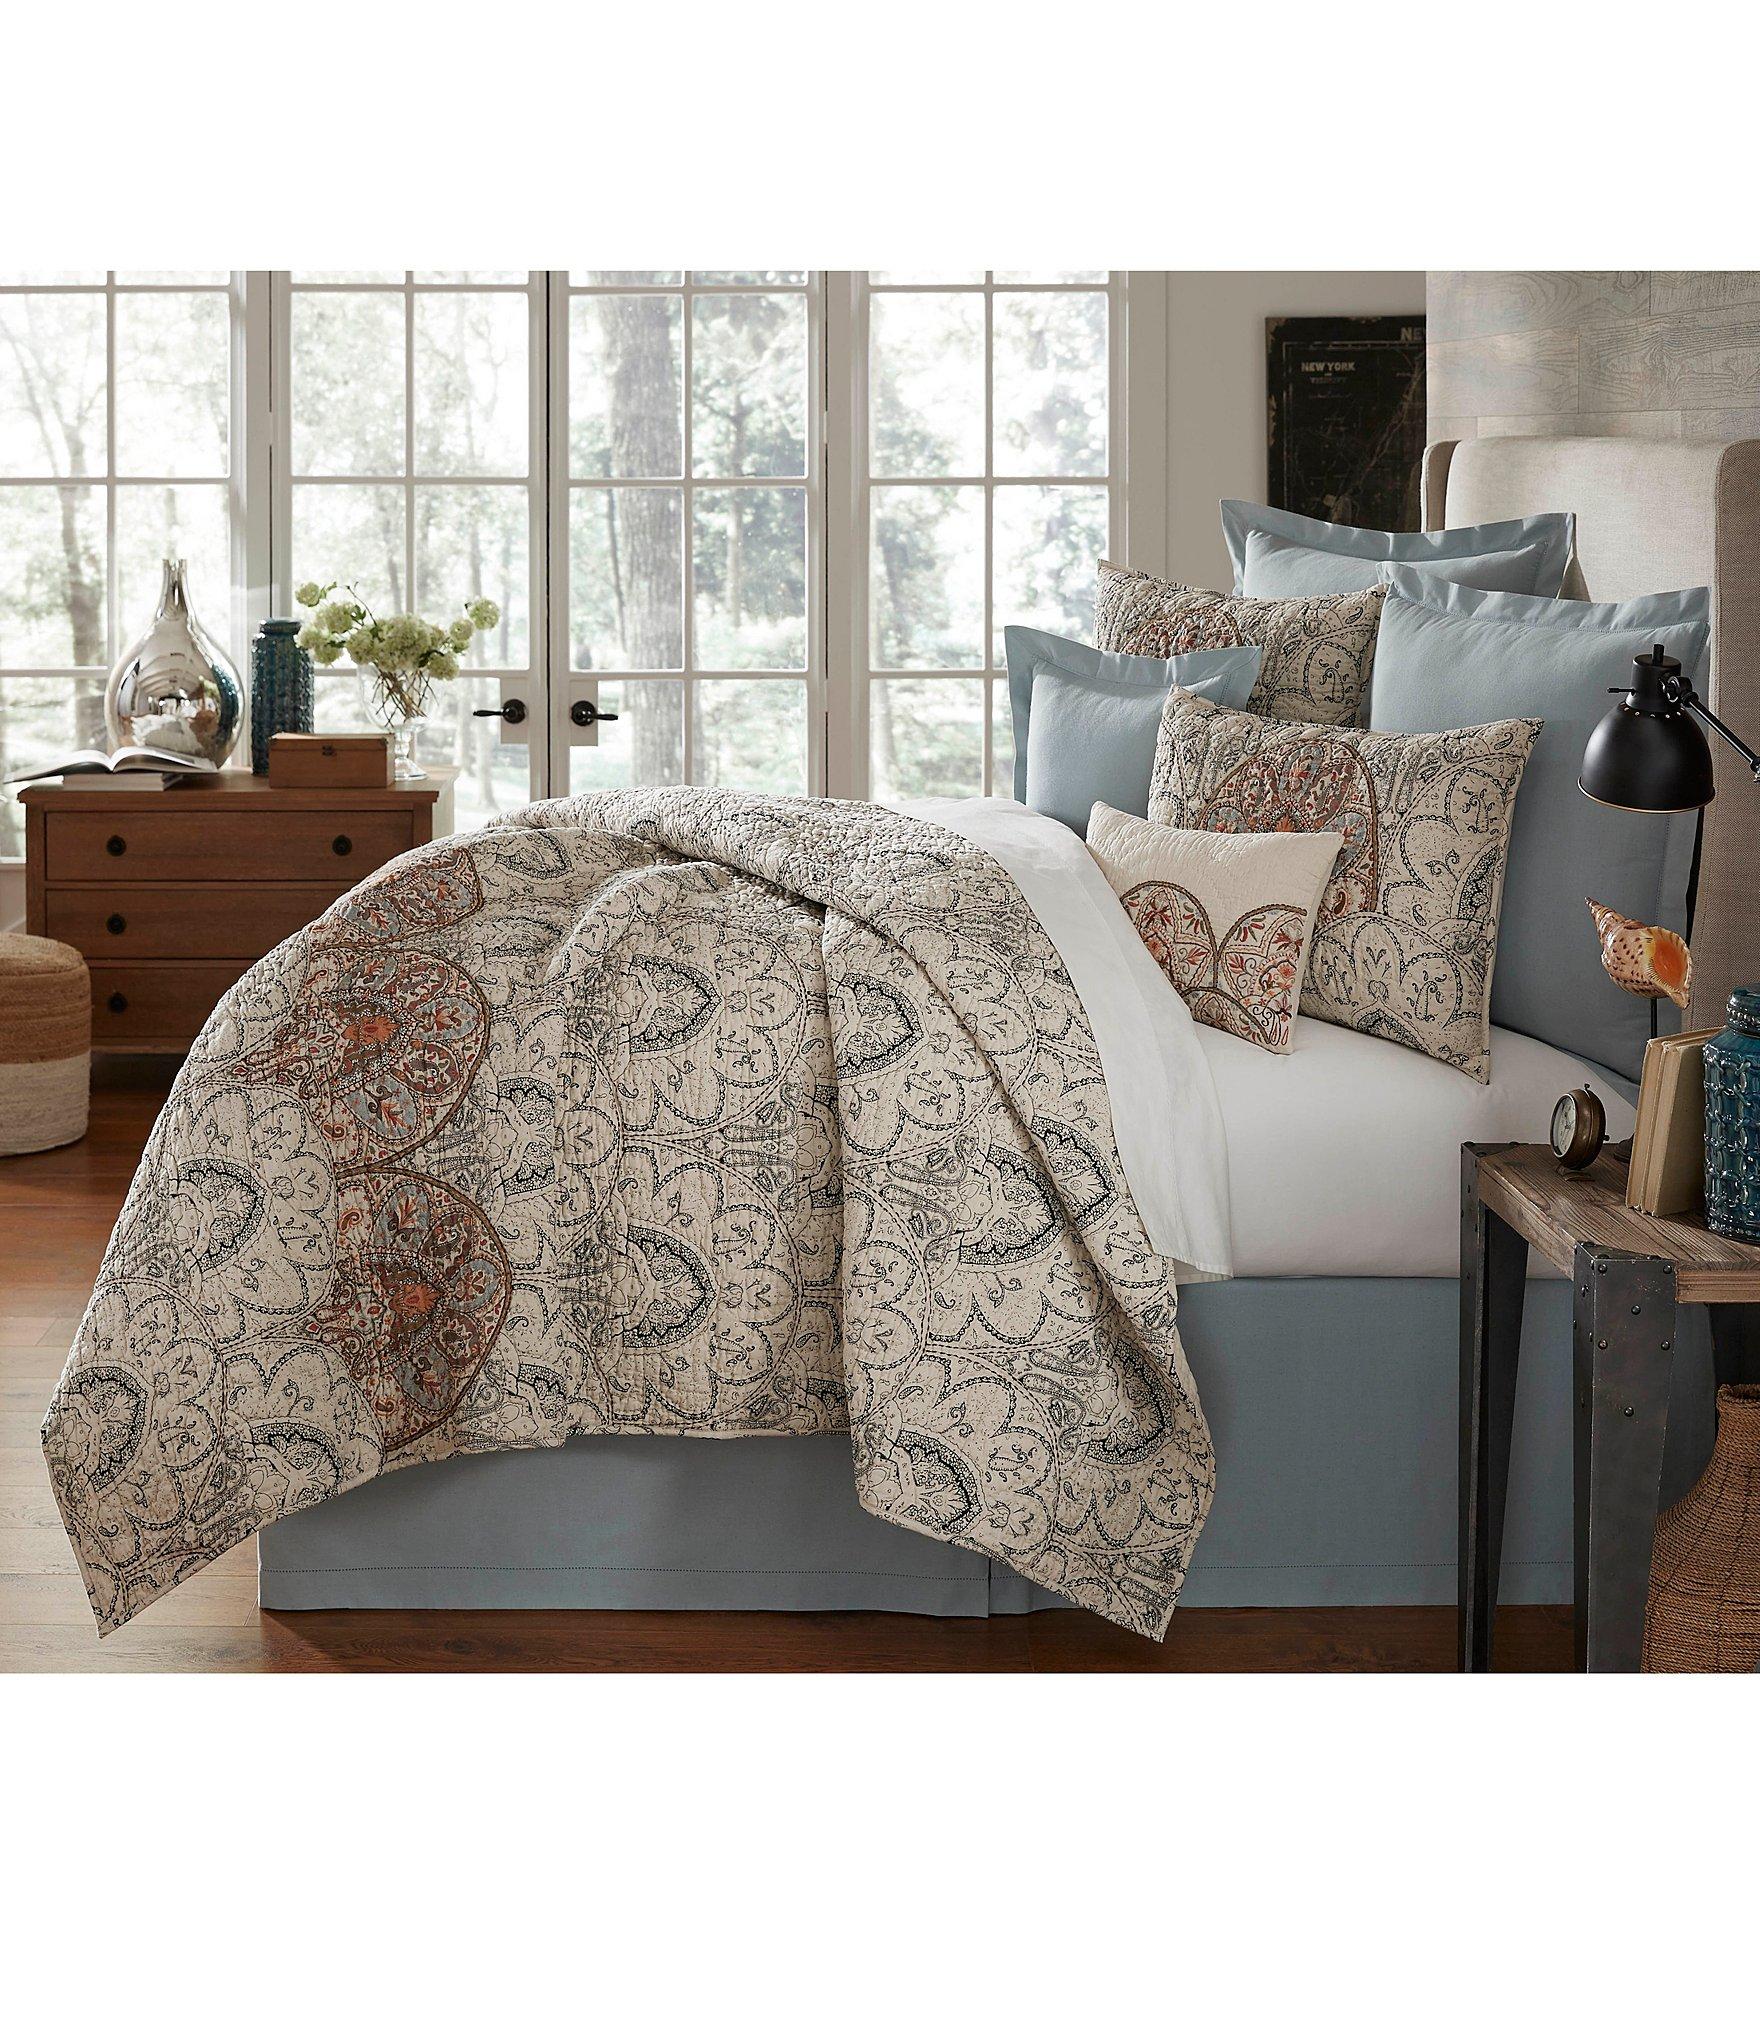 home  bedding  quilts  coverlets  dillardscom -